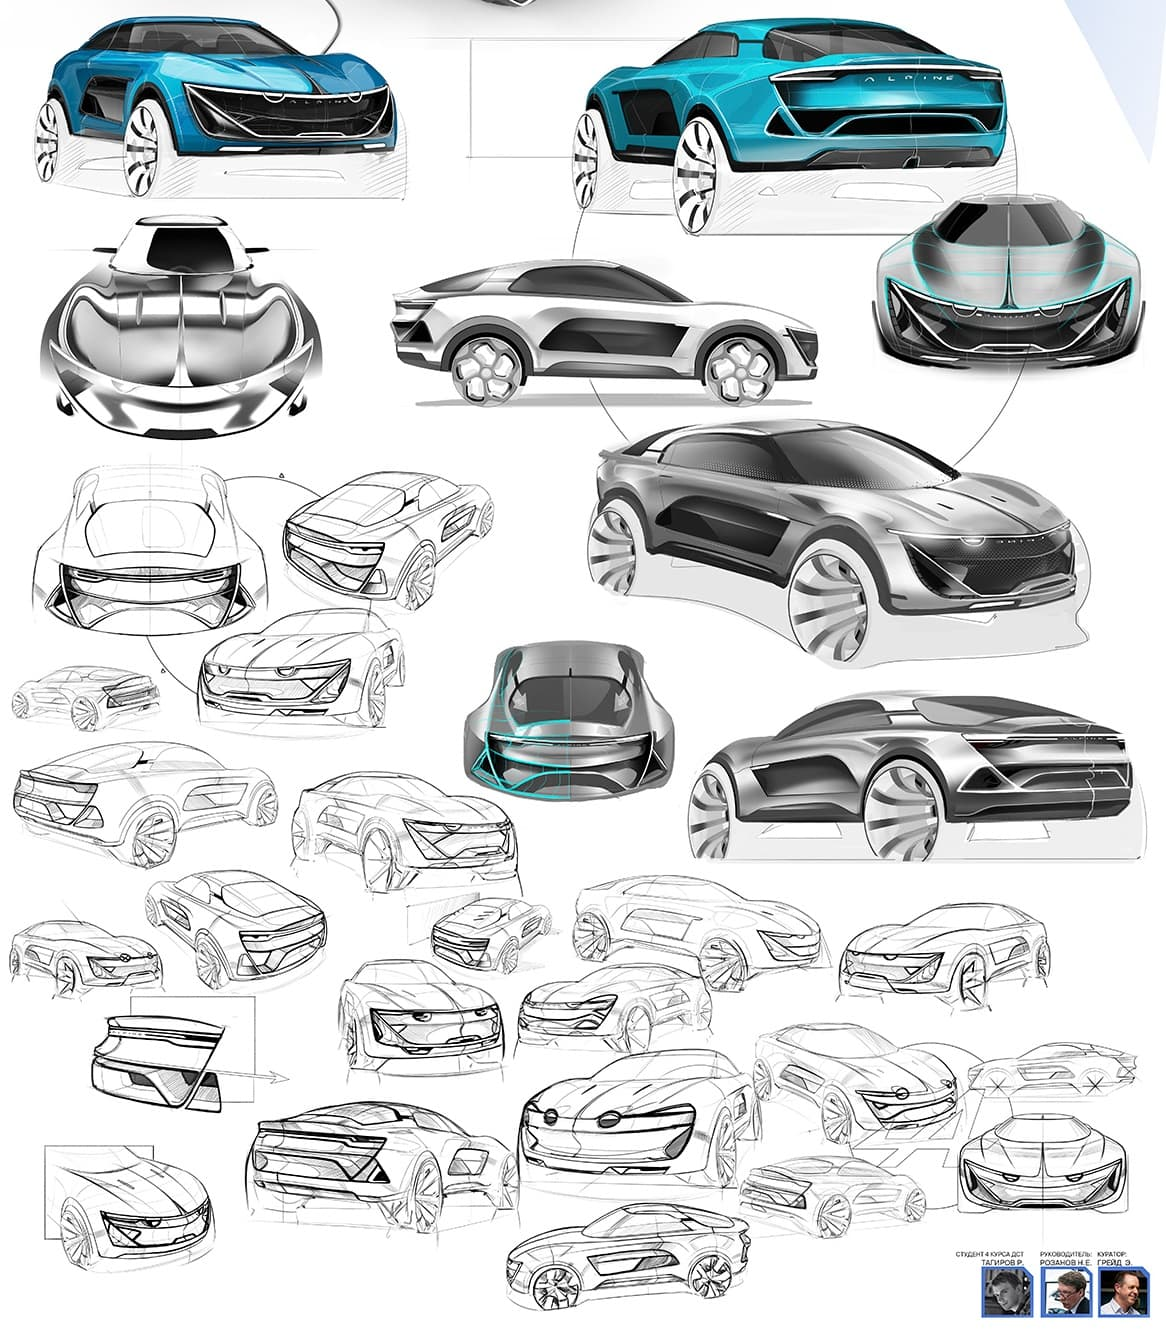 Alpine SUV 8   Le futur SUV Alpine peut-être en fuite... Sketch 2016